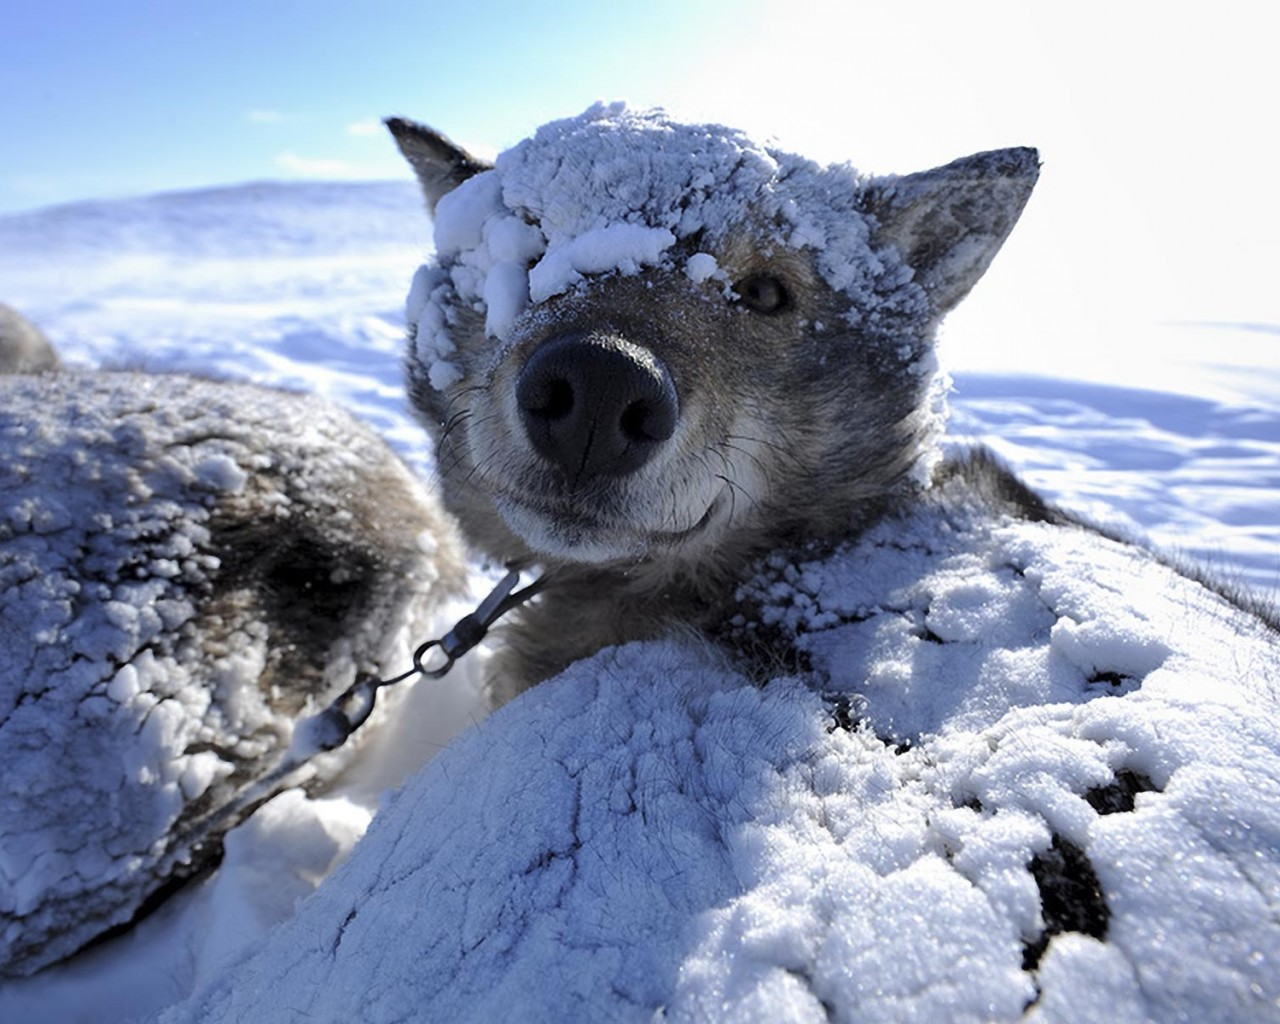 Dog In The Snow Windows 8 Wallpaper HD 1280x1024